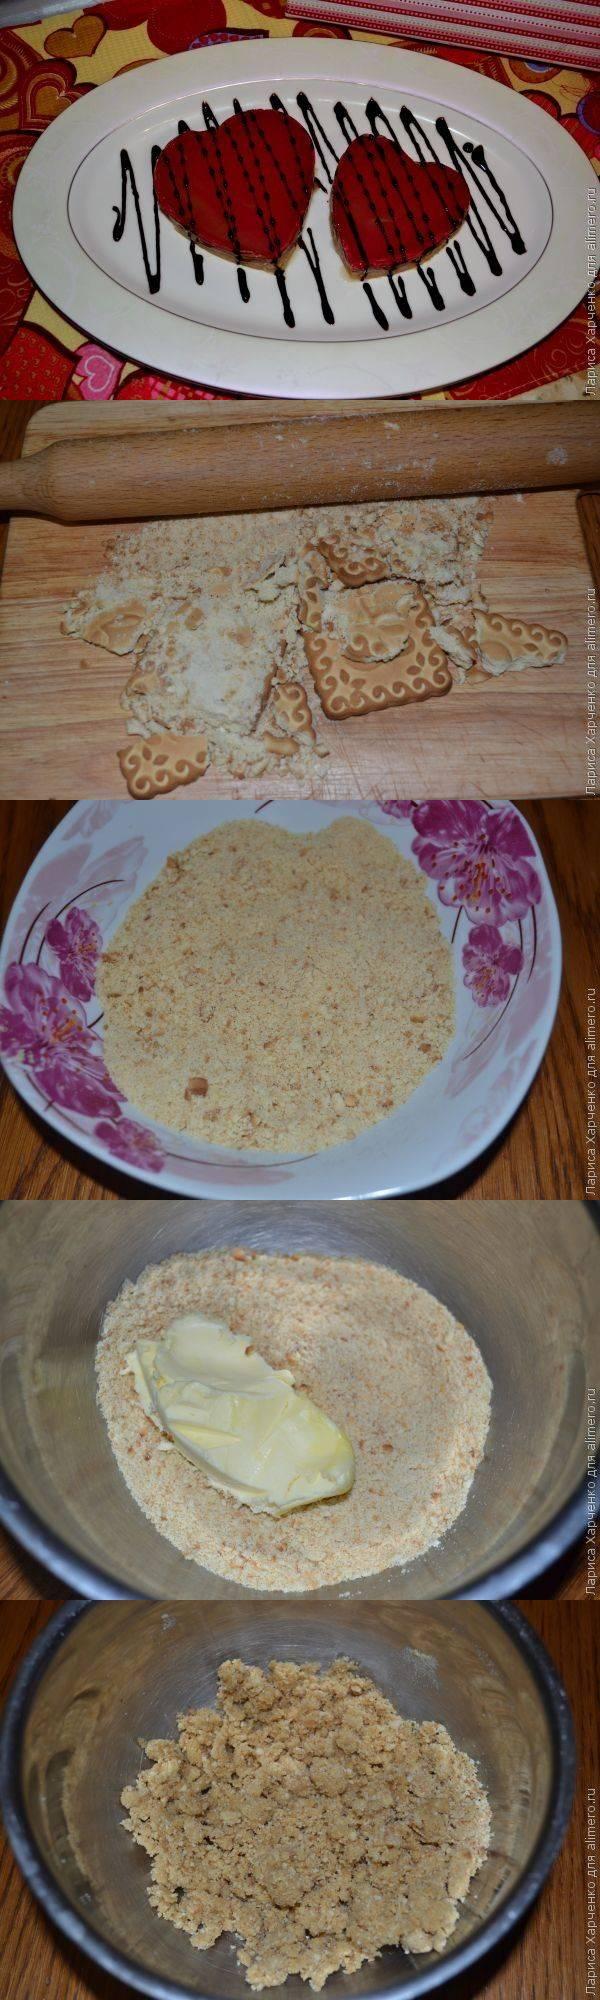 Романтический десерт